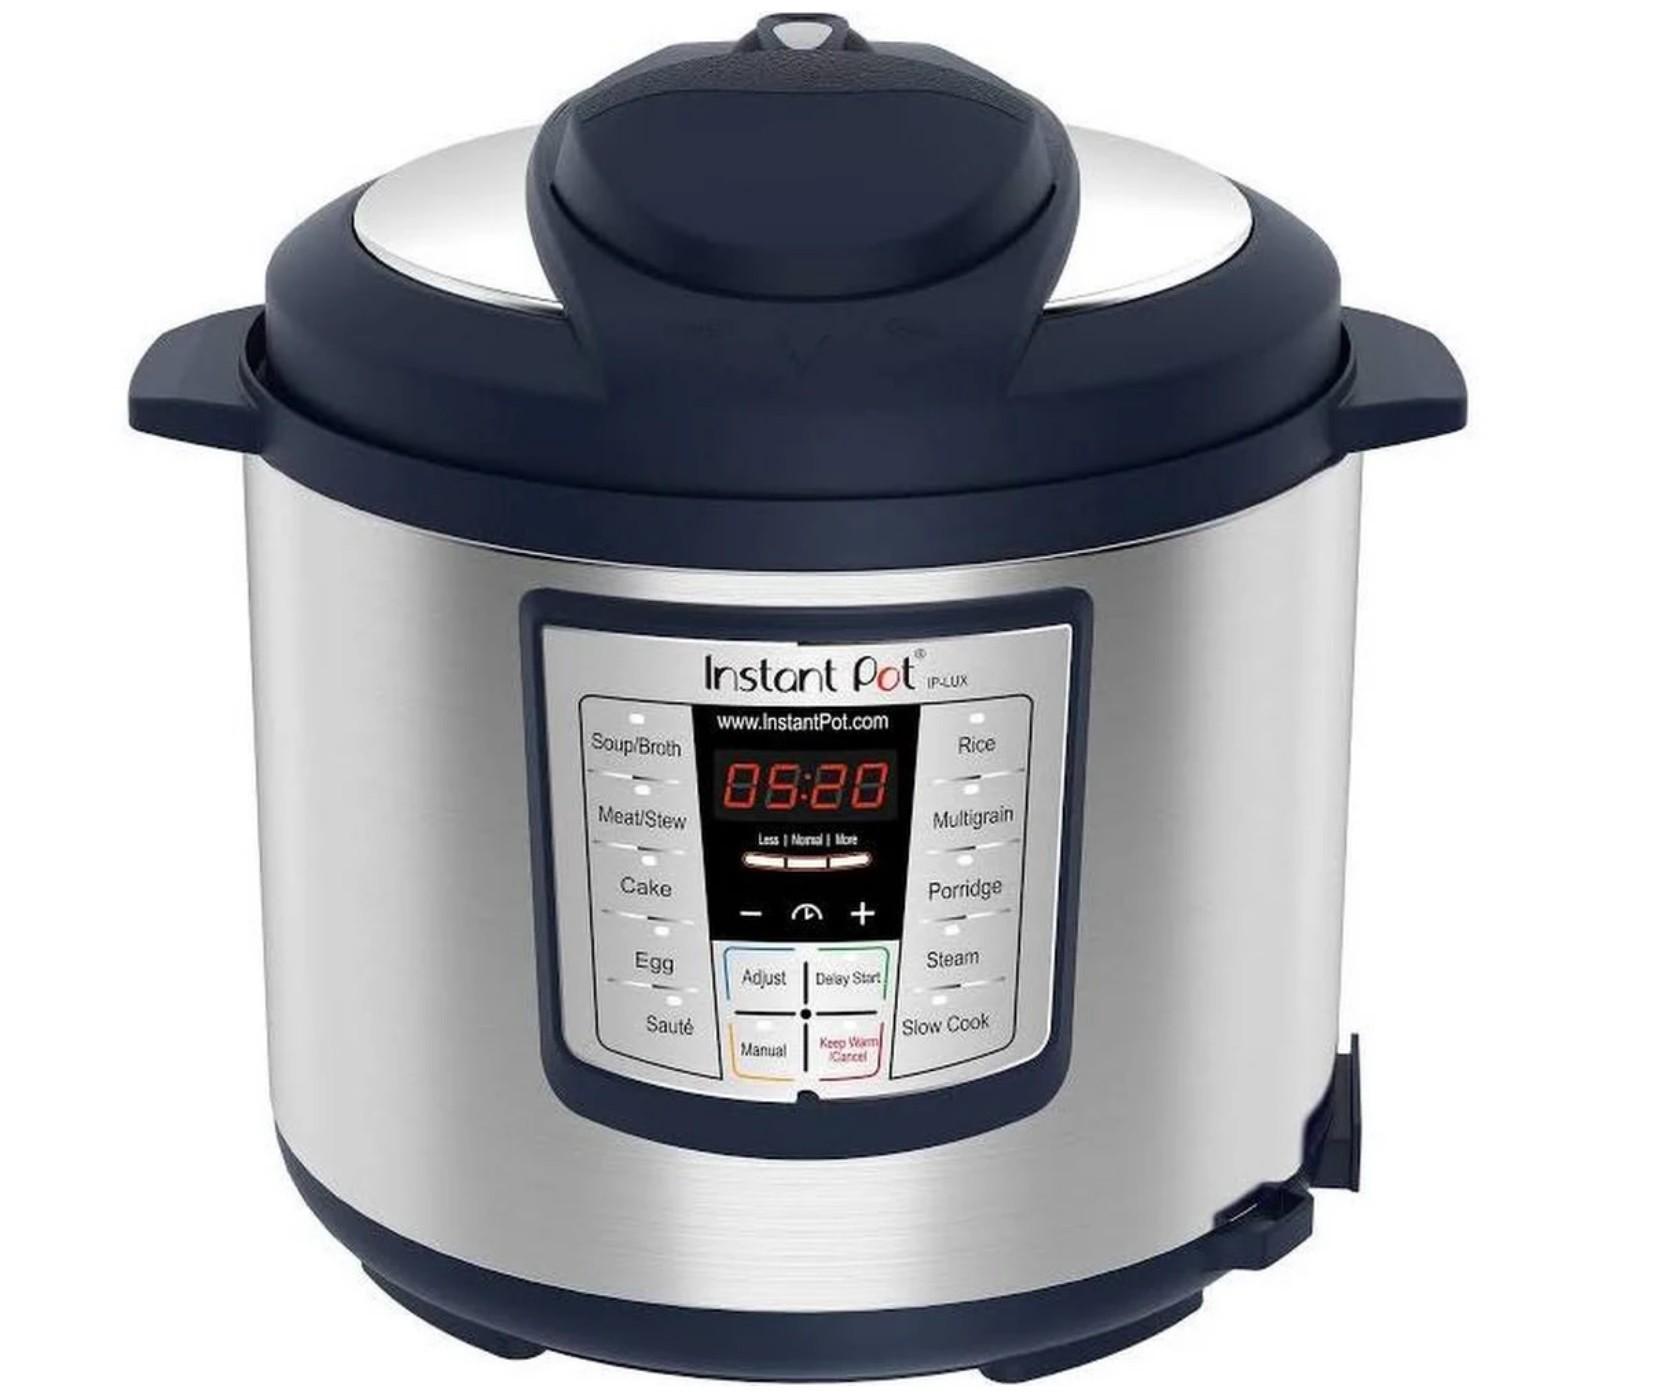 e93c7adcf0b0 6Qt. Instant Pot Aura Multi Cooker $51 or 6qt Instant Pot Lux Electric Pressure  Cooker $42.50 + free s/h